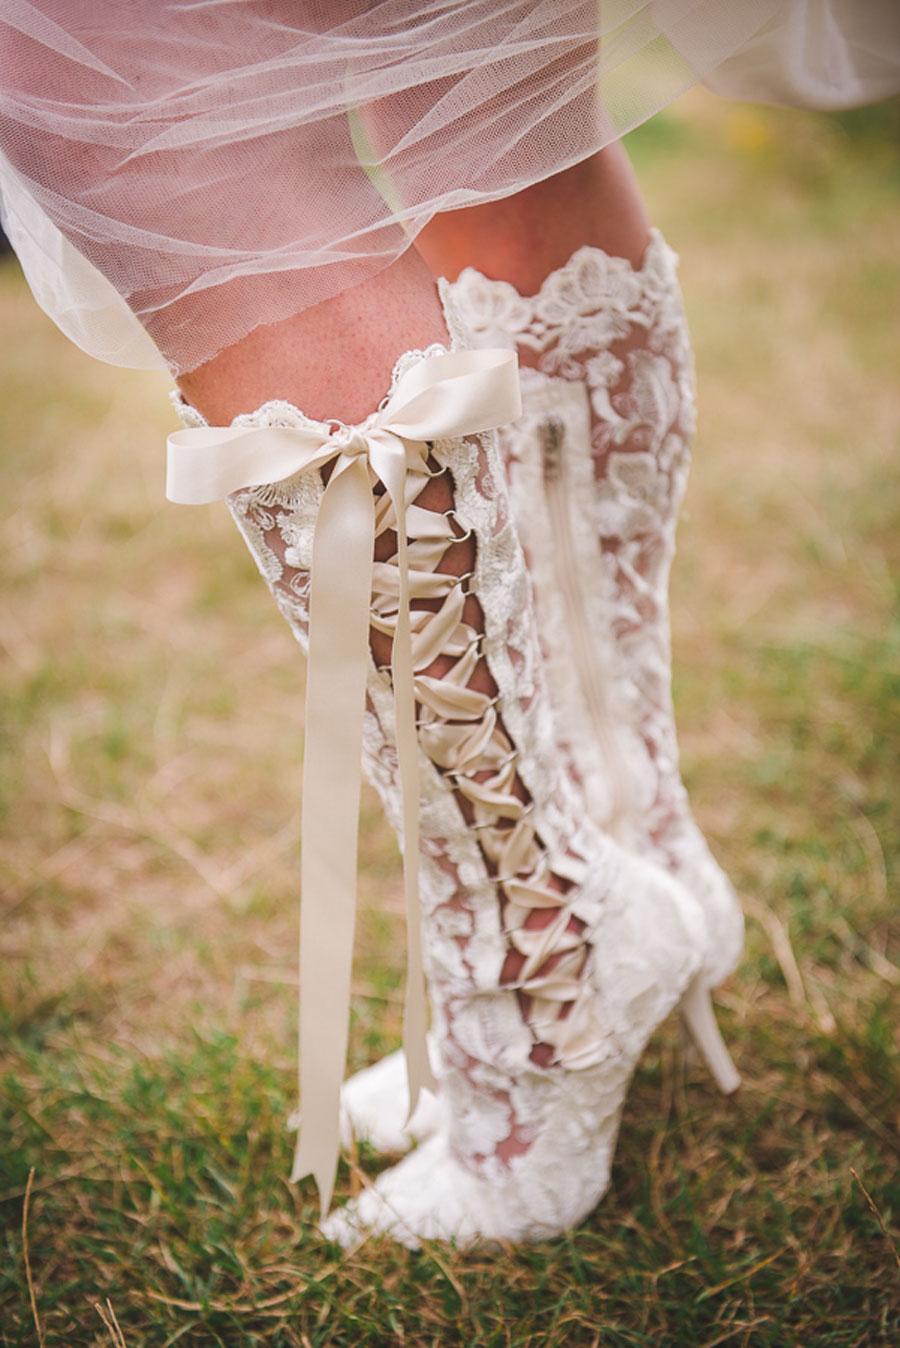 A Late Summer Renaissance-Meets-Fantasy Themed Bridal Shoot0040